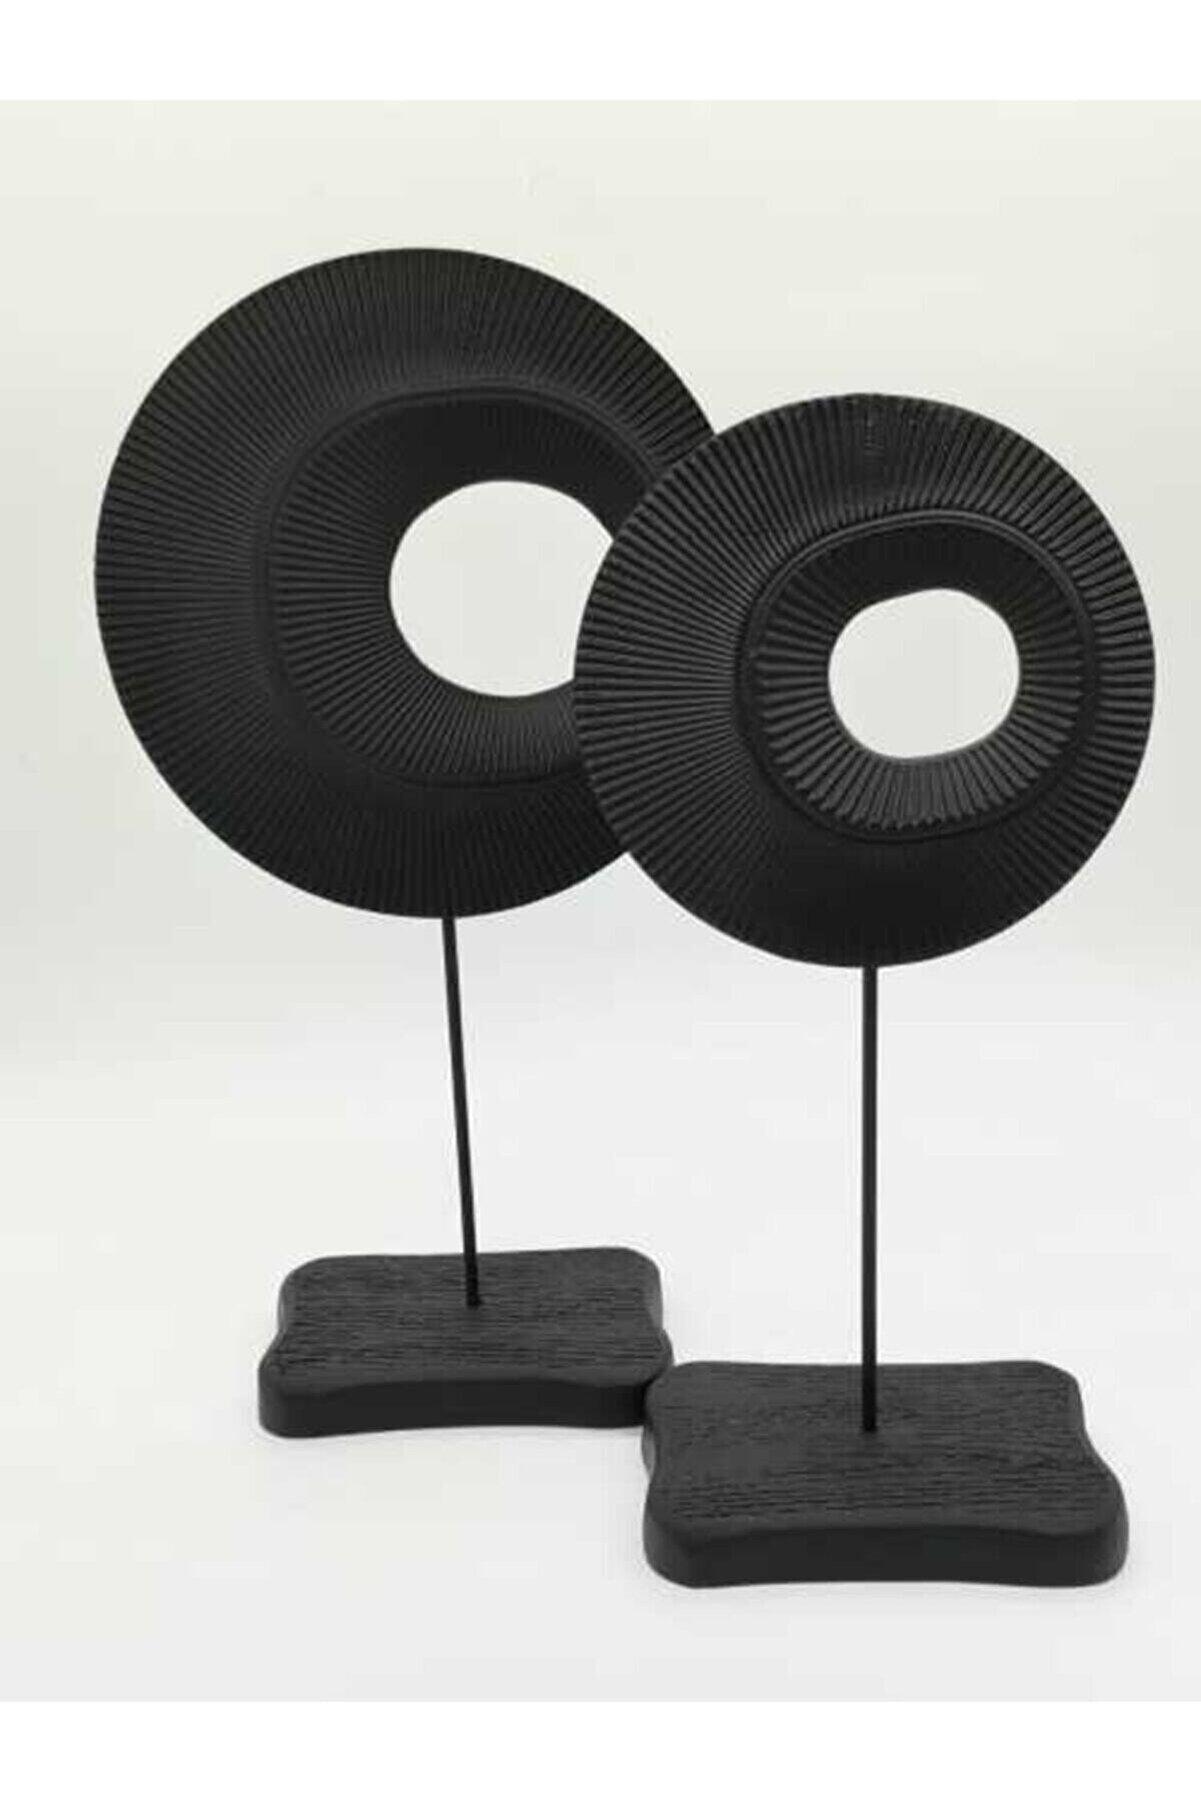 AysalStore Dekoratif Siyah Halka Obje 2'li Set Biblo Mat Siyah